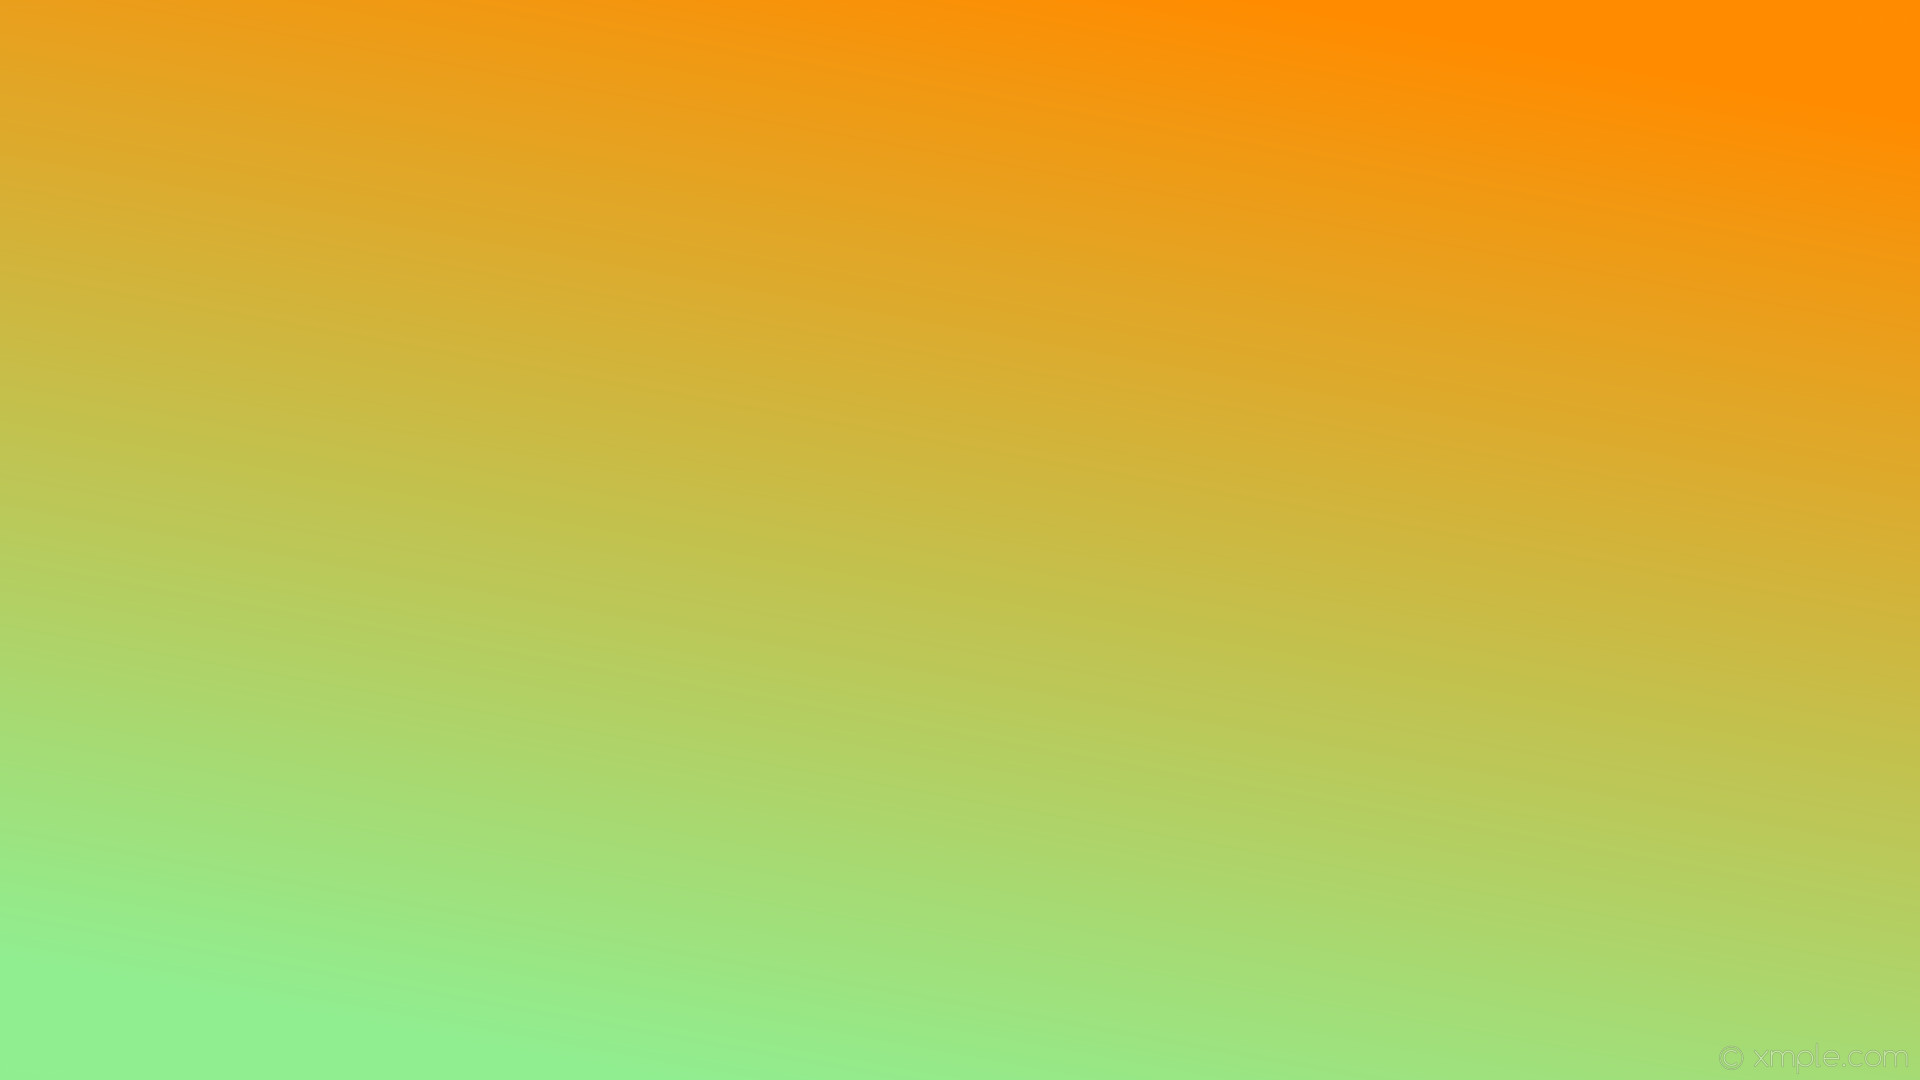 wallpaper green orange linear gradient light green dark orange #90ee90  #ff8c00 240°